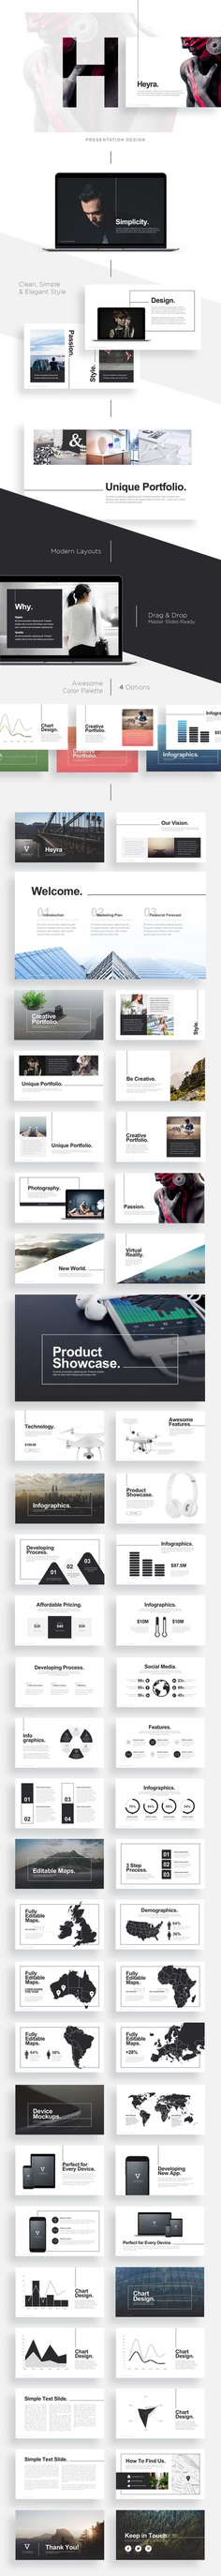 Heyra Presentation Design on Behance